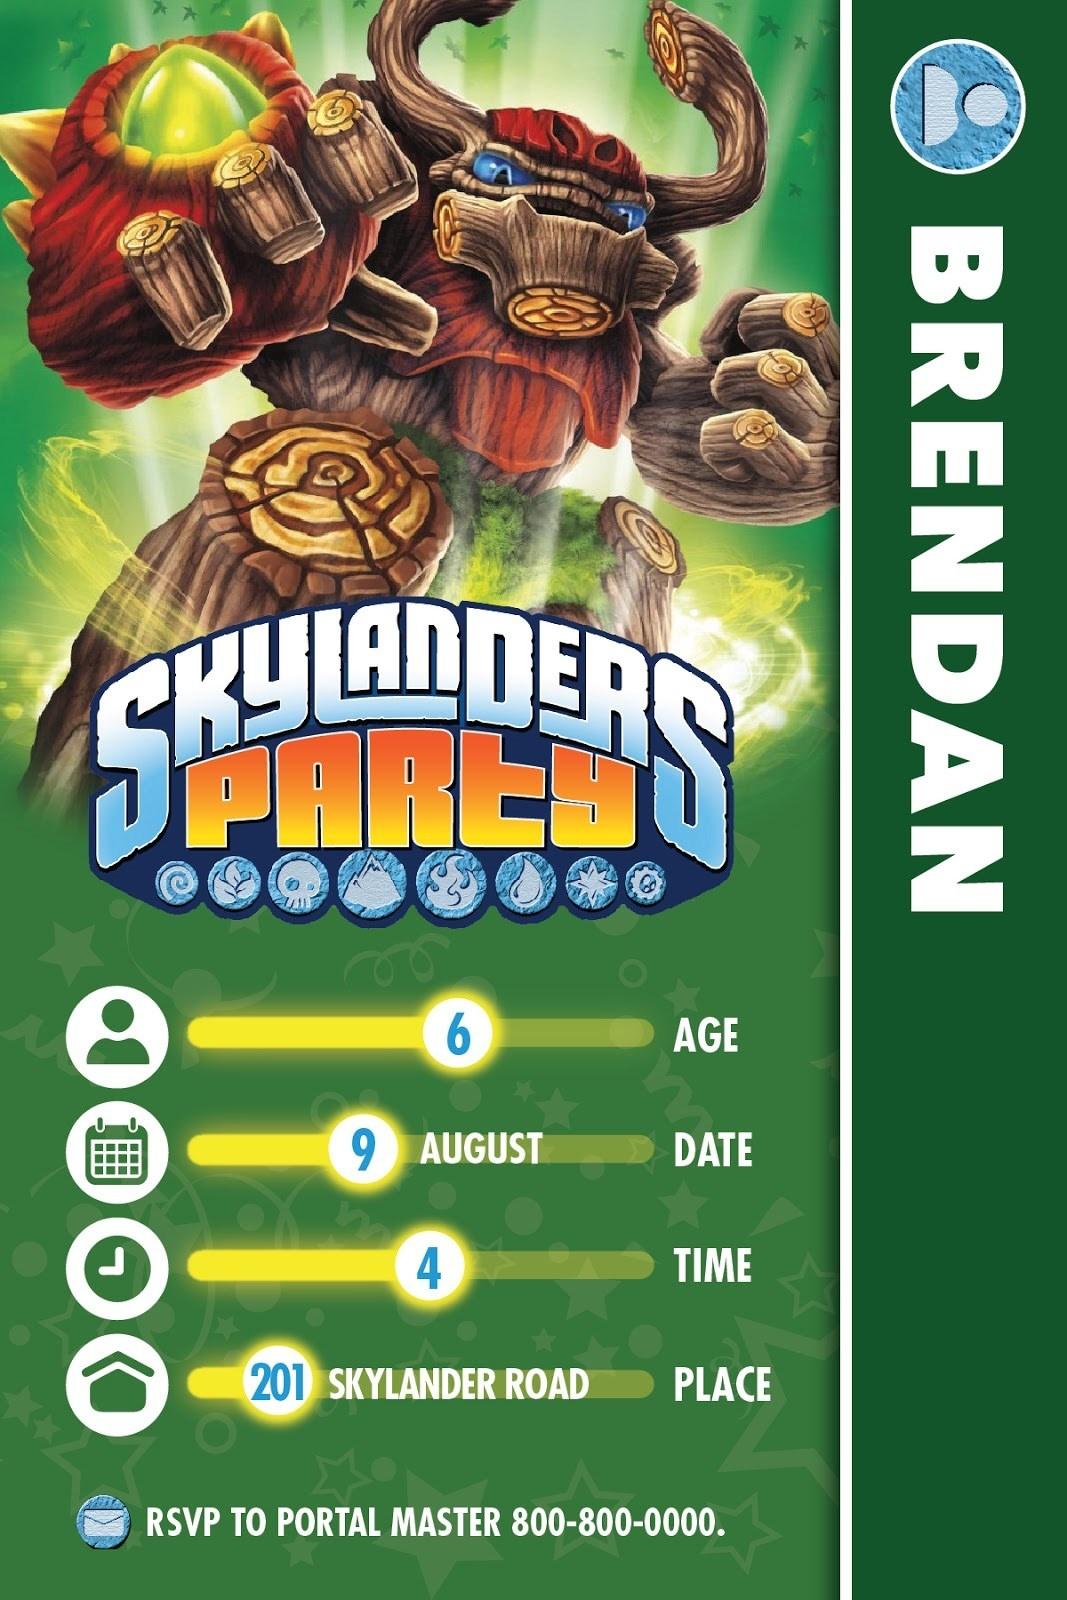 95+ Skylanders Birthday Invitations Printable - Some Of The Best - Free Printable Skylander Invitations